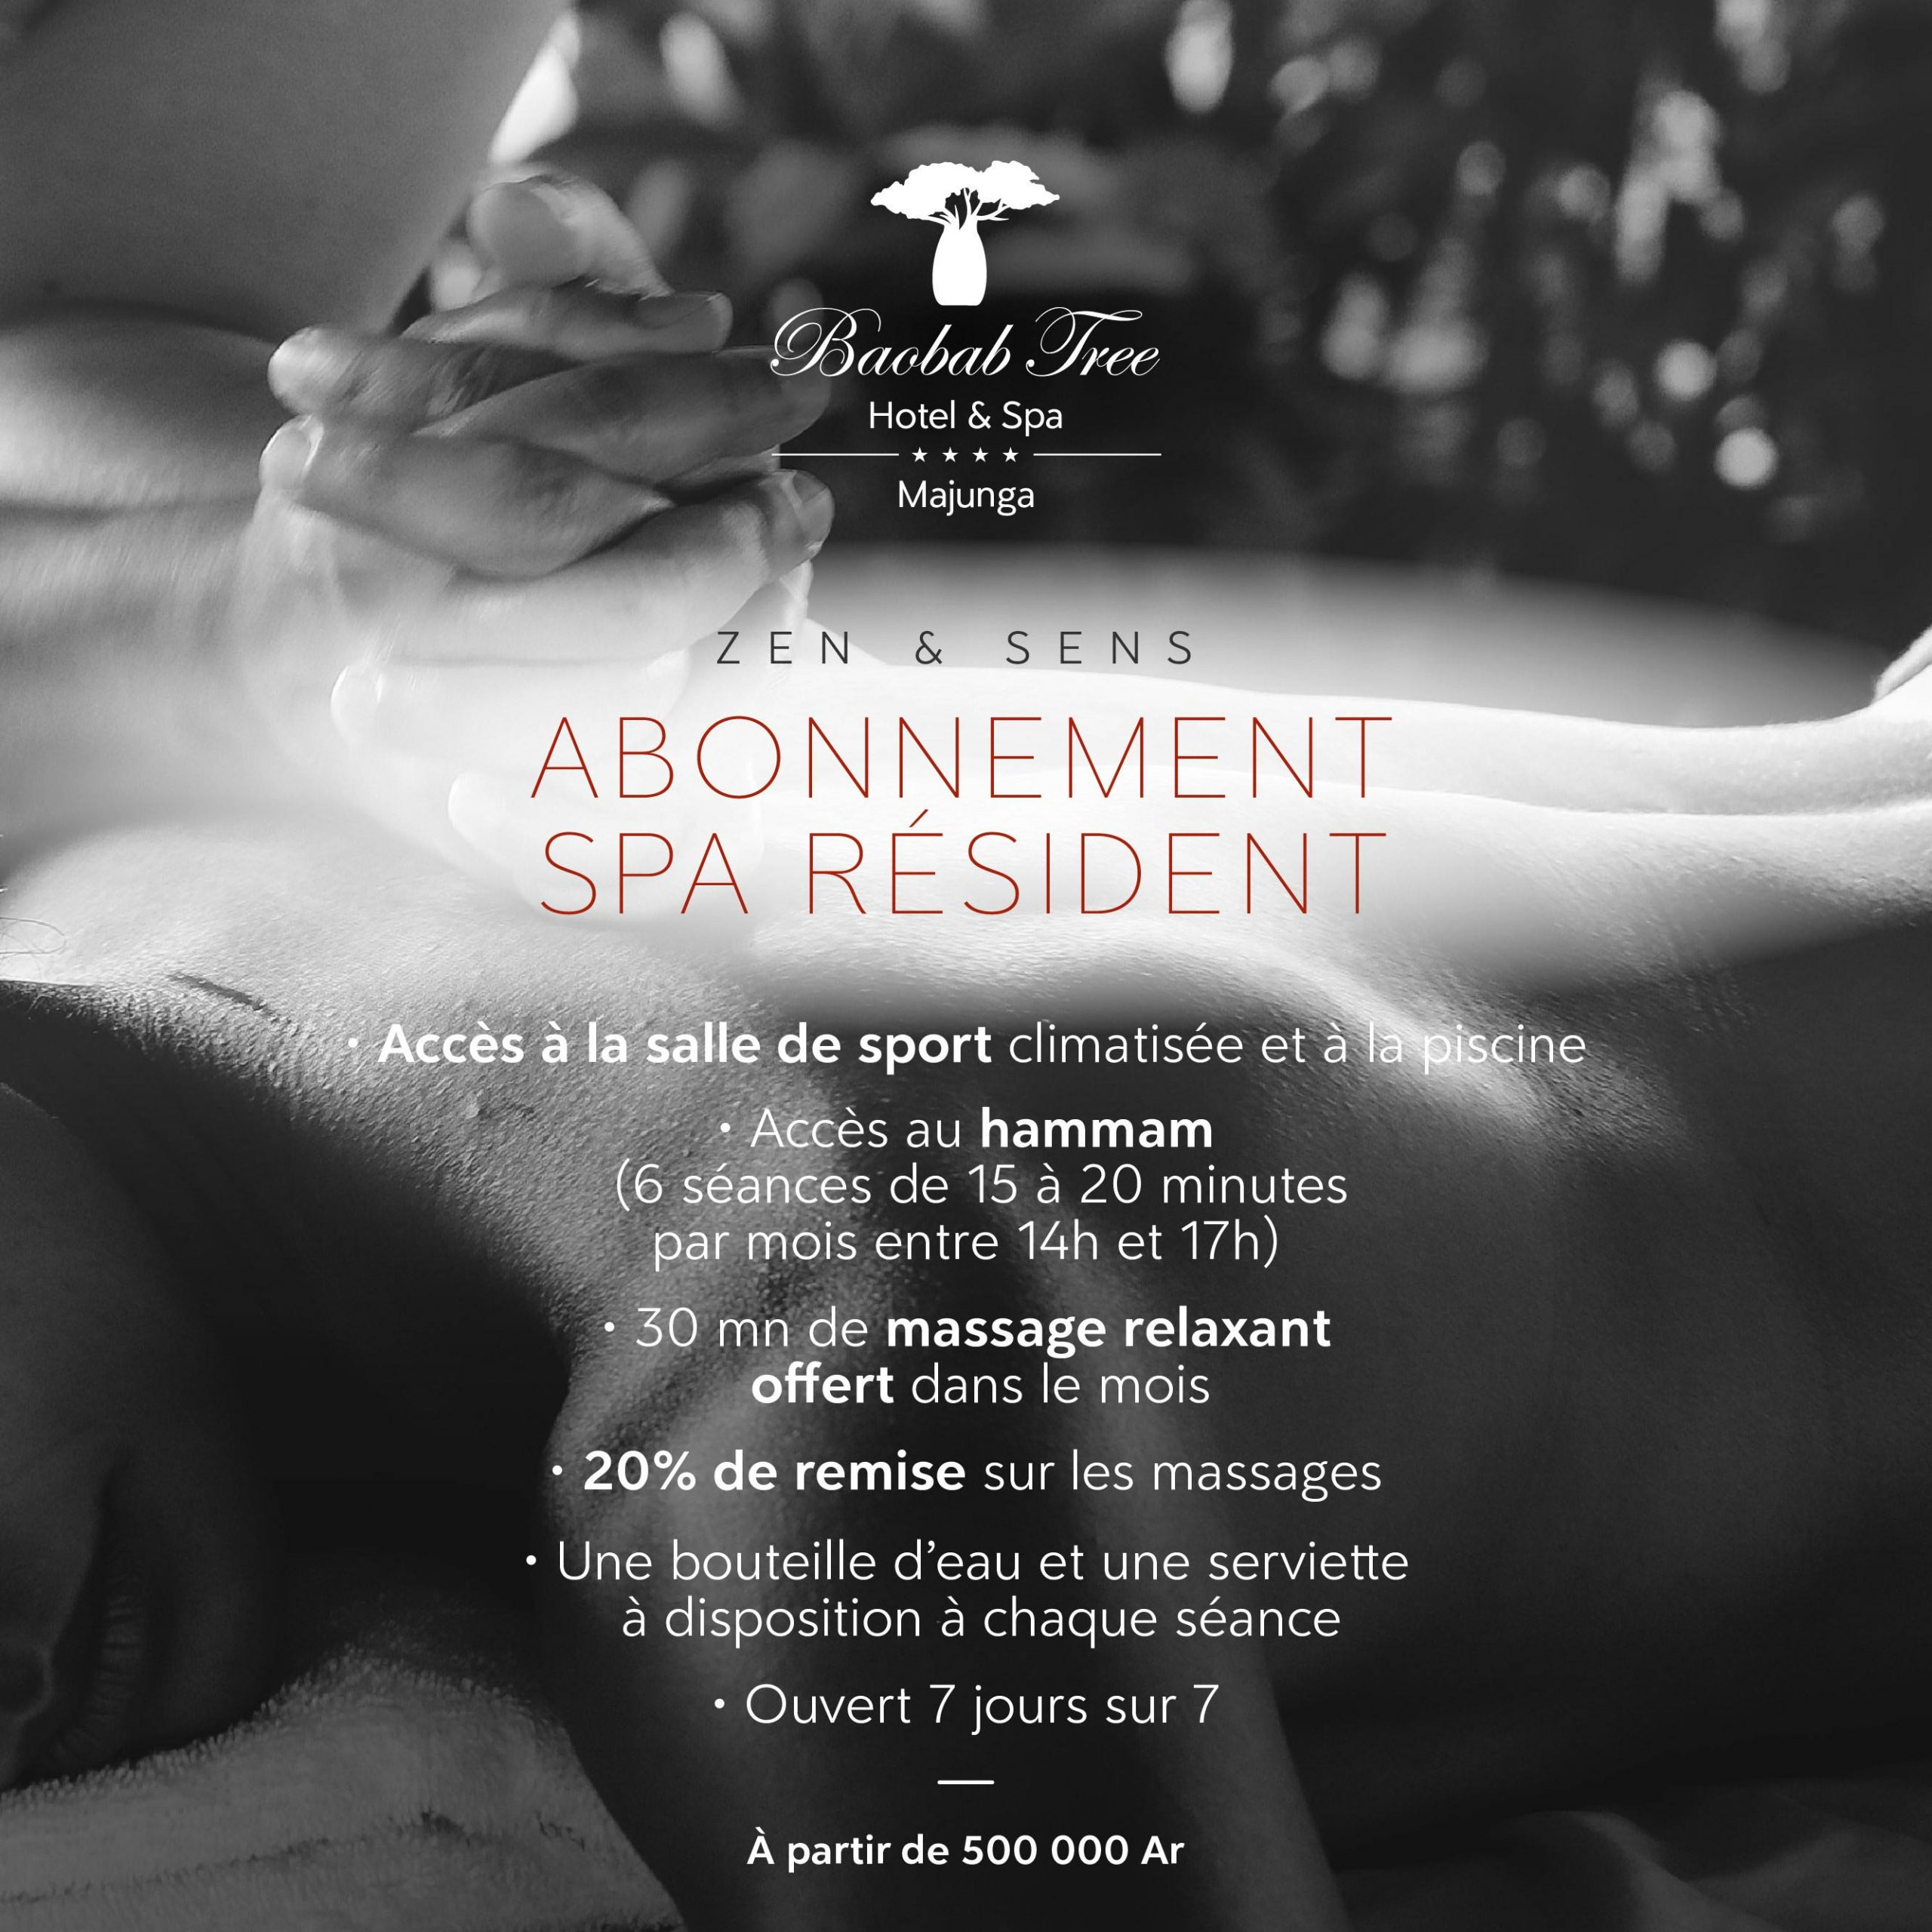 Offre abonnement resident baobab tree hotel & spa mahajanga